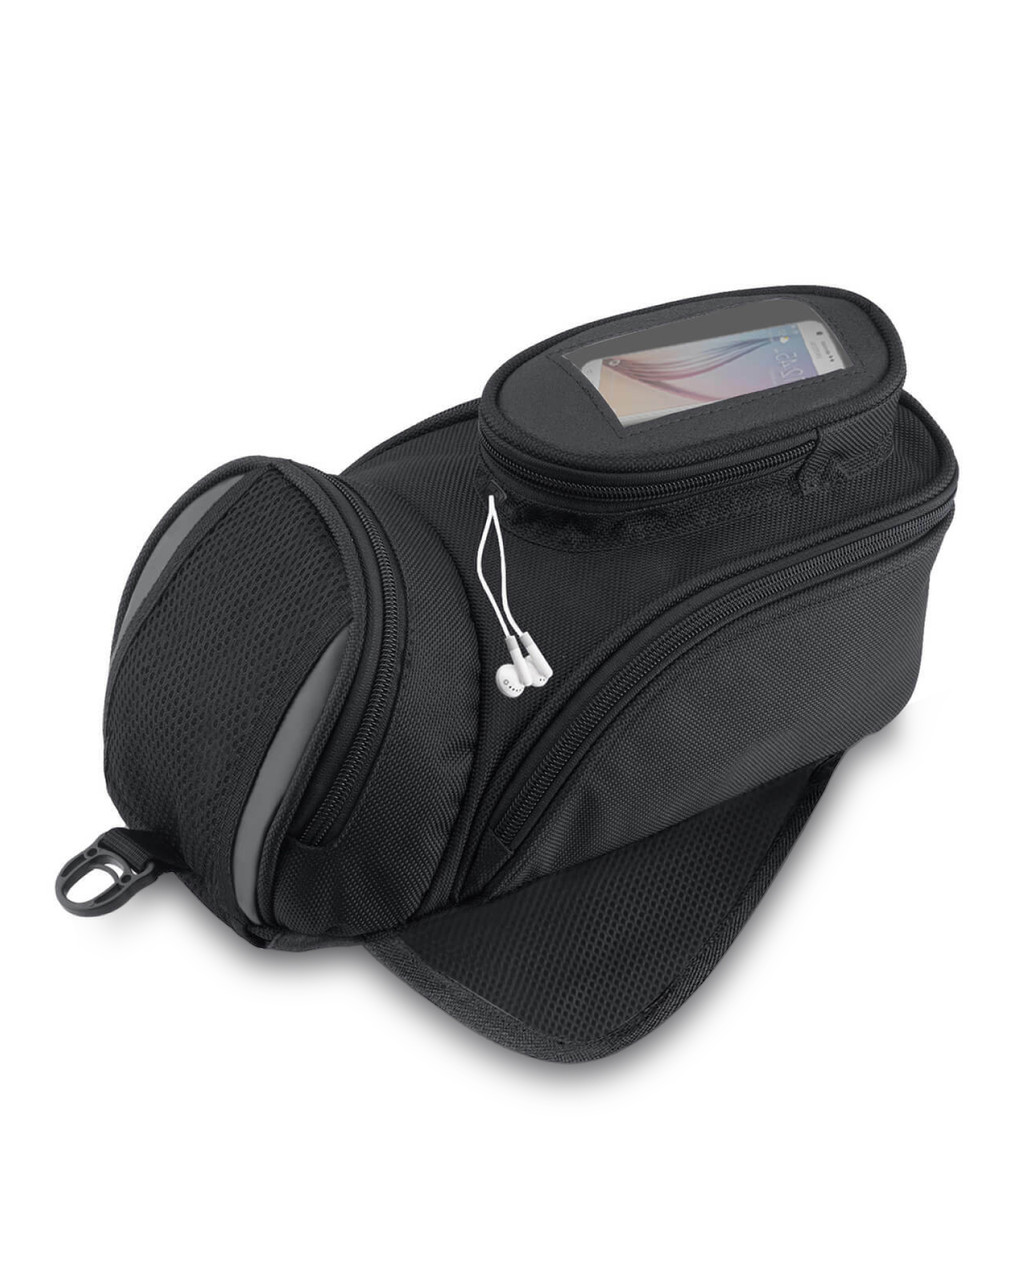 VikingBags Survival Series Triumph Magnetic Motorcycle Tank Bag Main Bag View